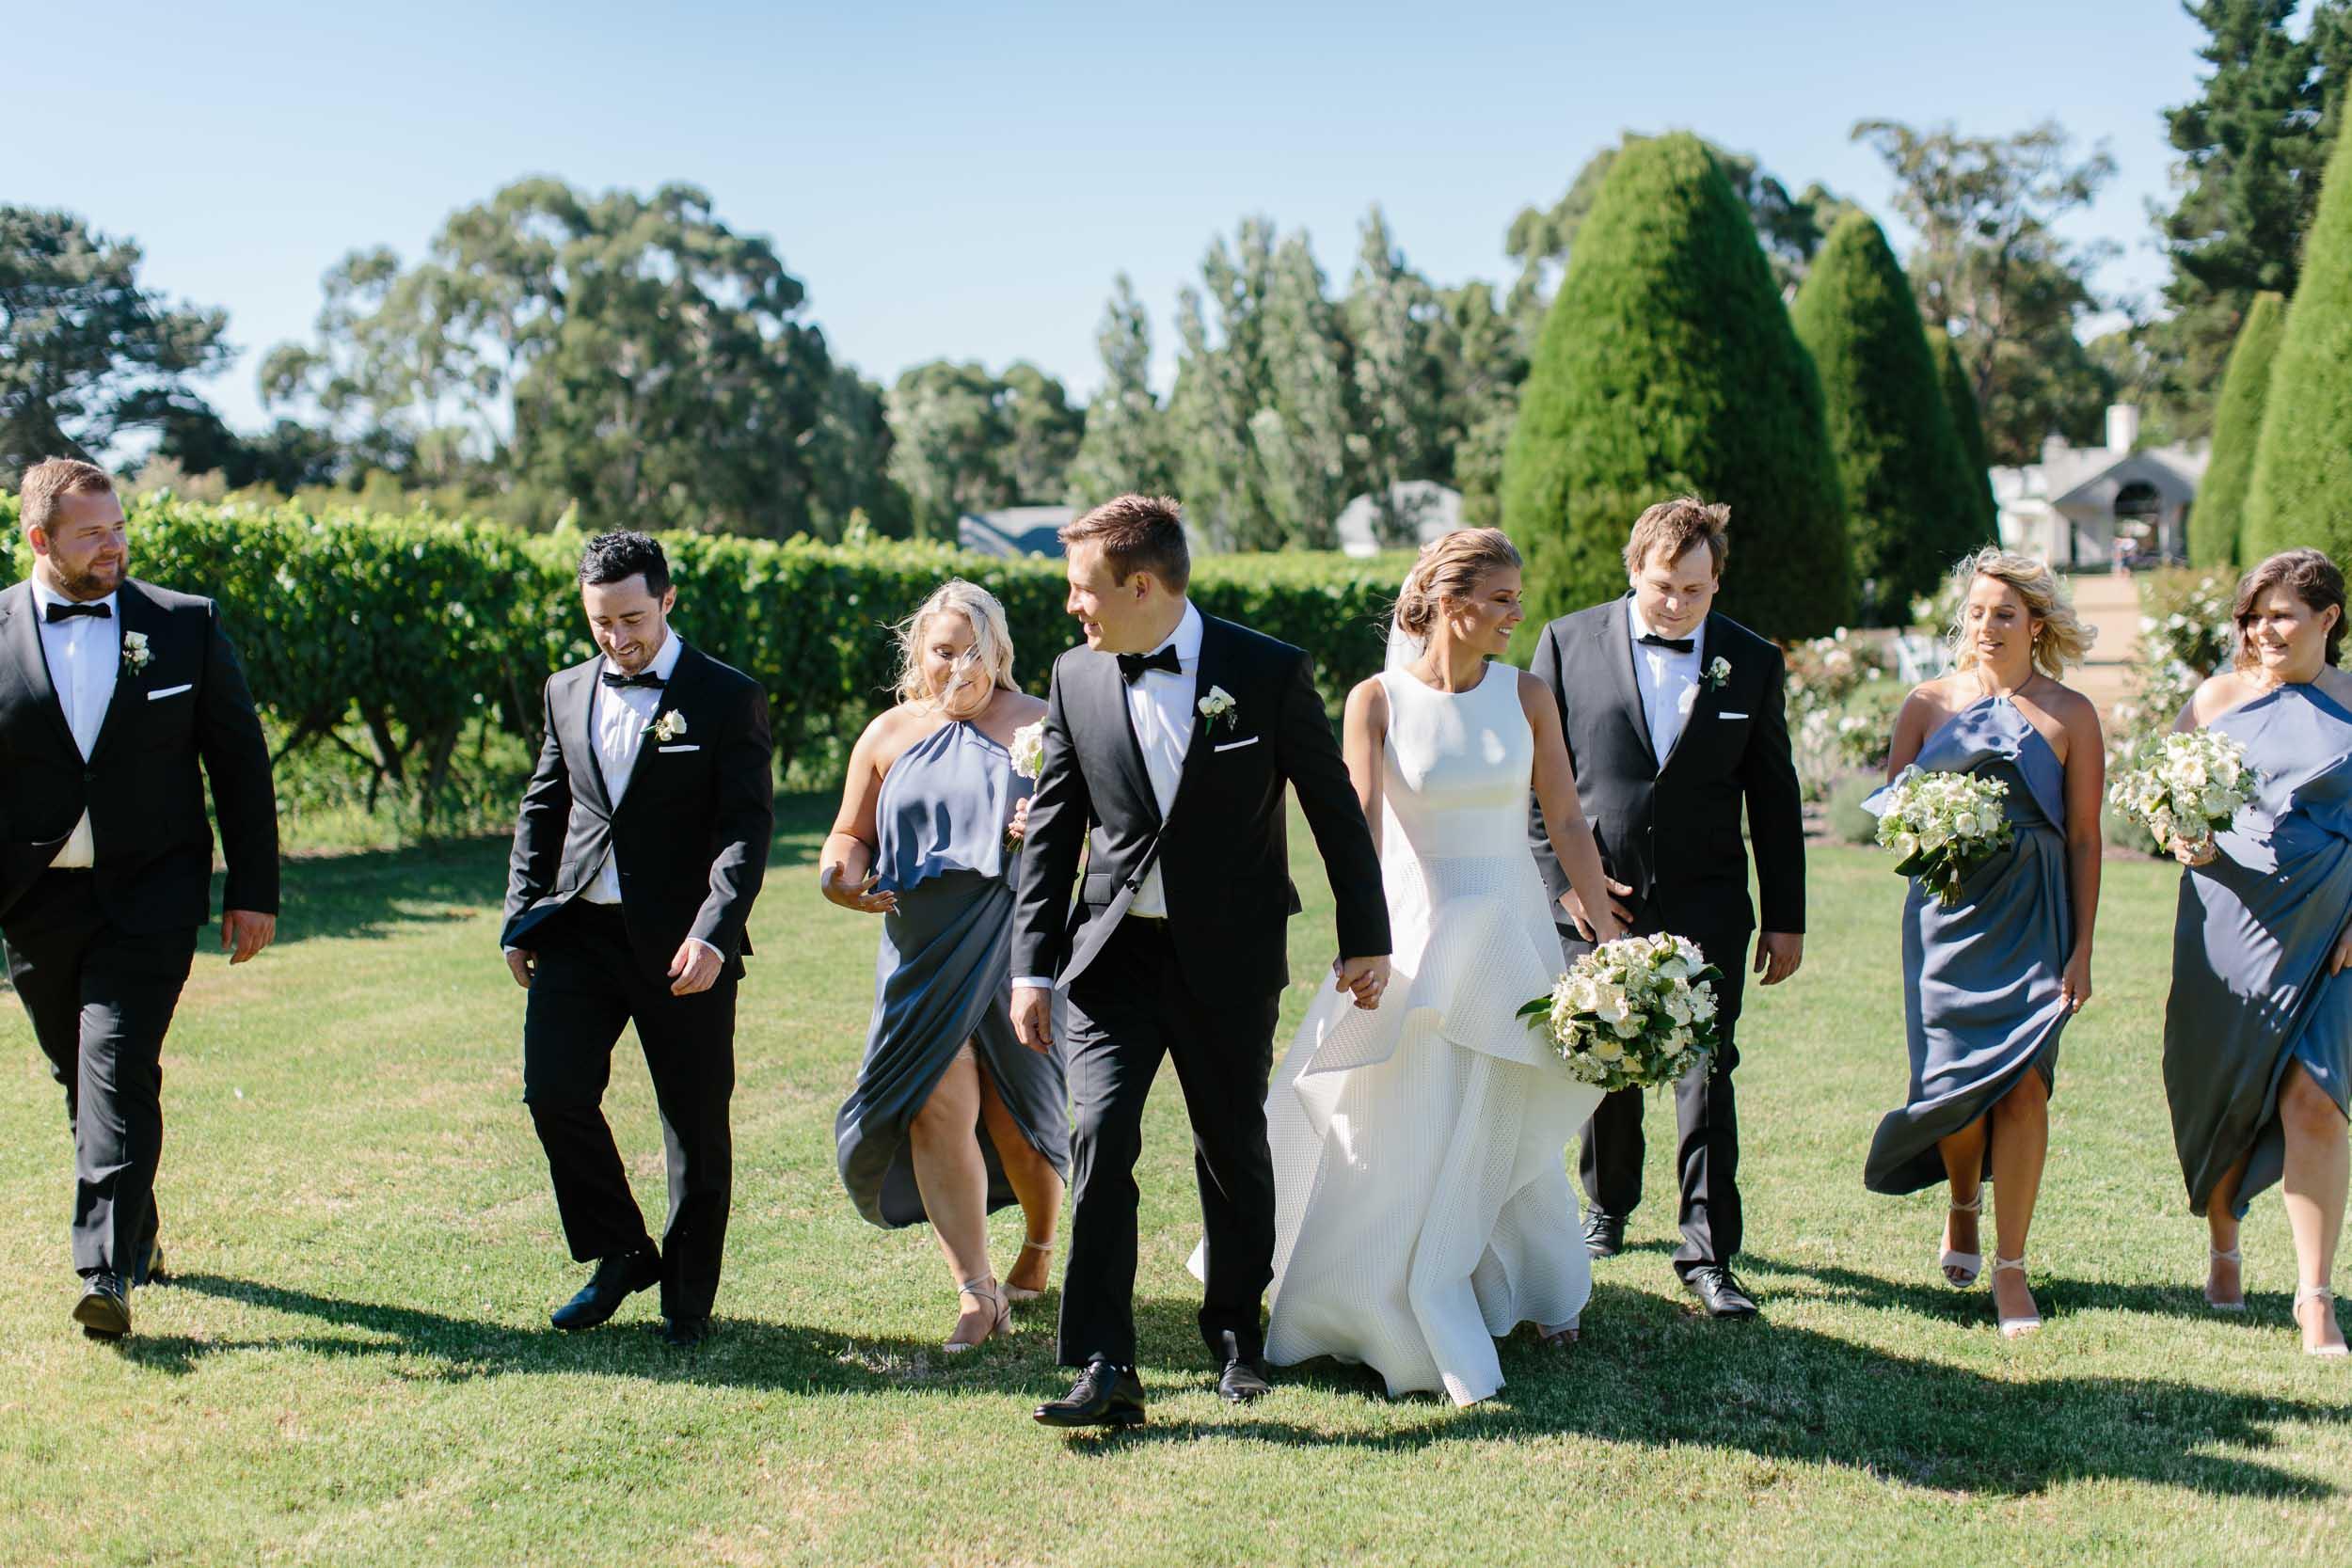 Kas-Richards-Mornington-Peninsula-Wedding-Lindenderry-Red-Hill-416.jpg